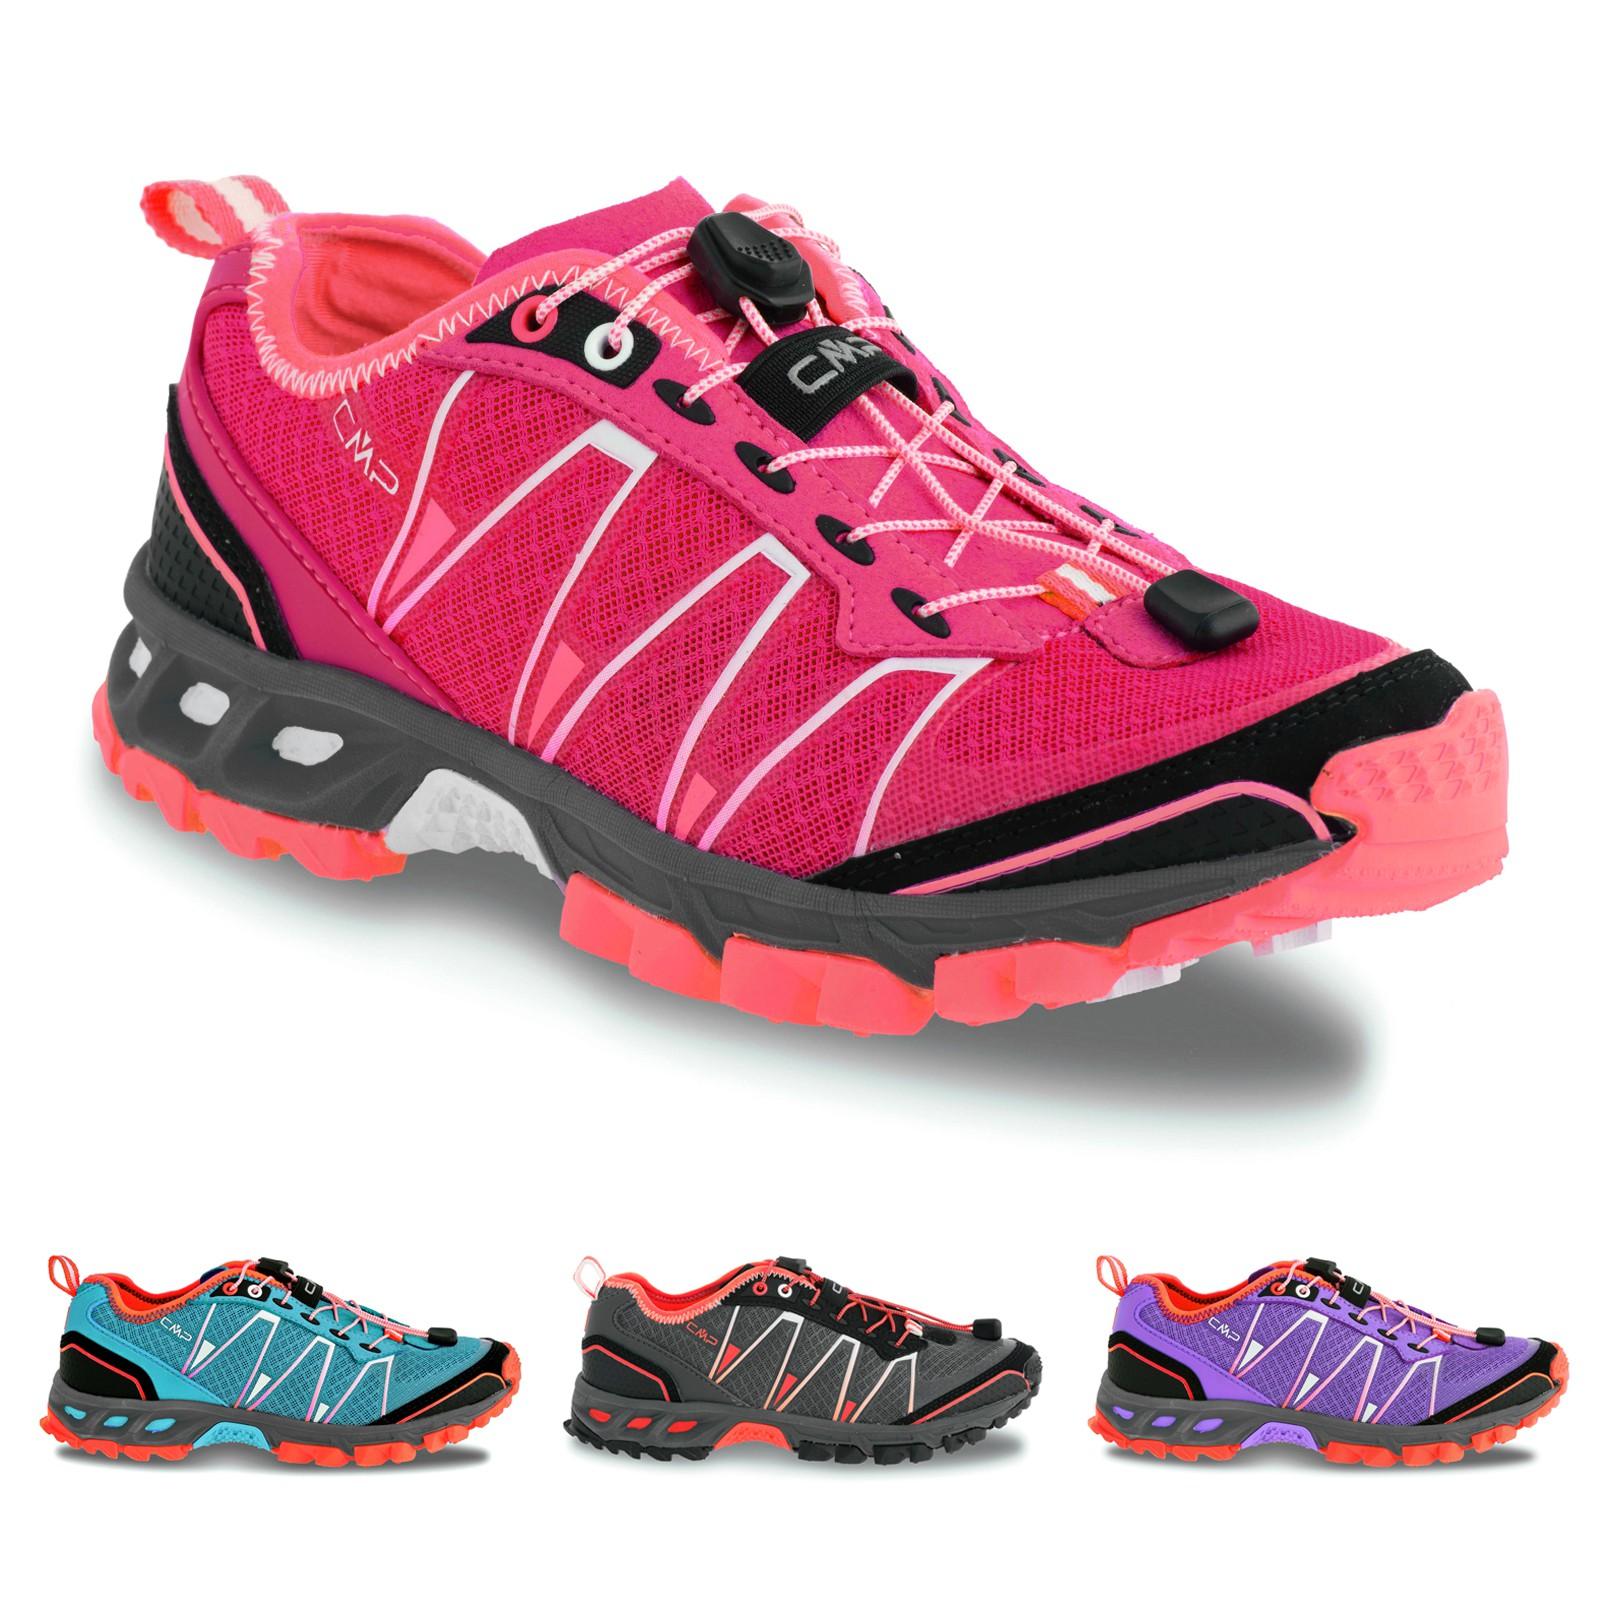 CMP Damen Trail Running Schuhe Laufschuhe Atlas in magenta